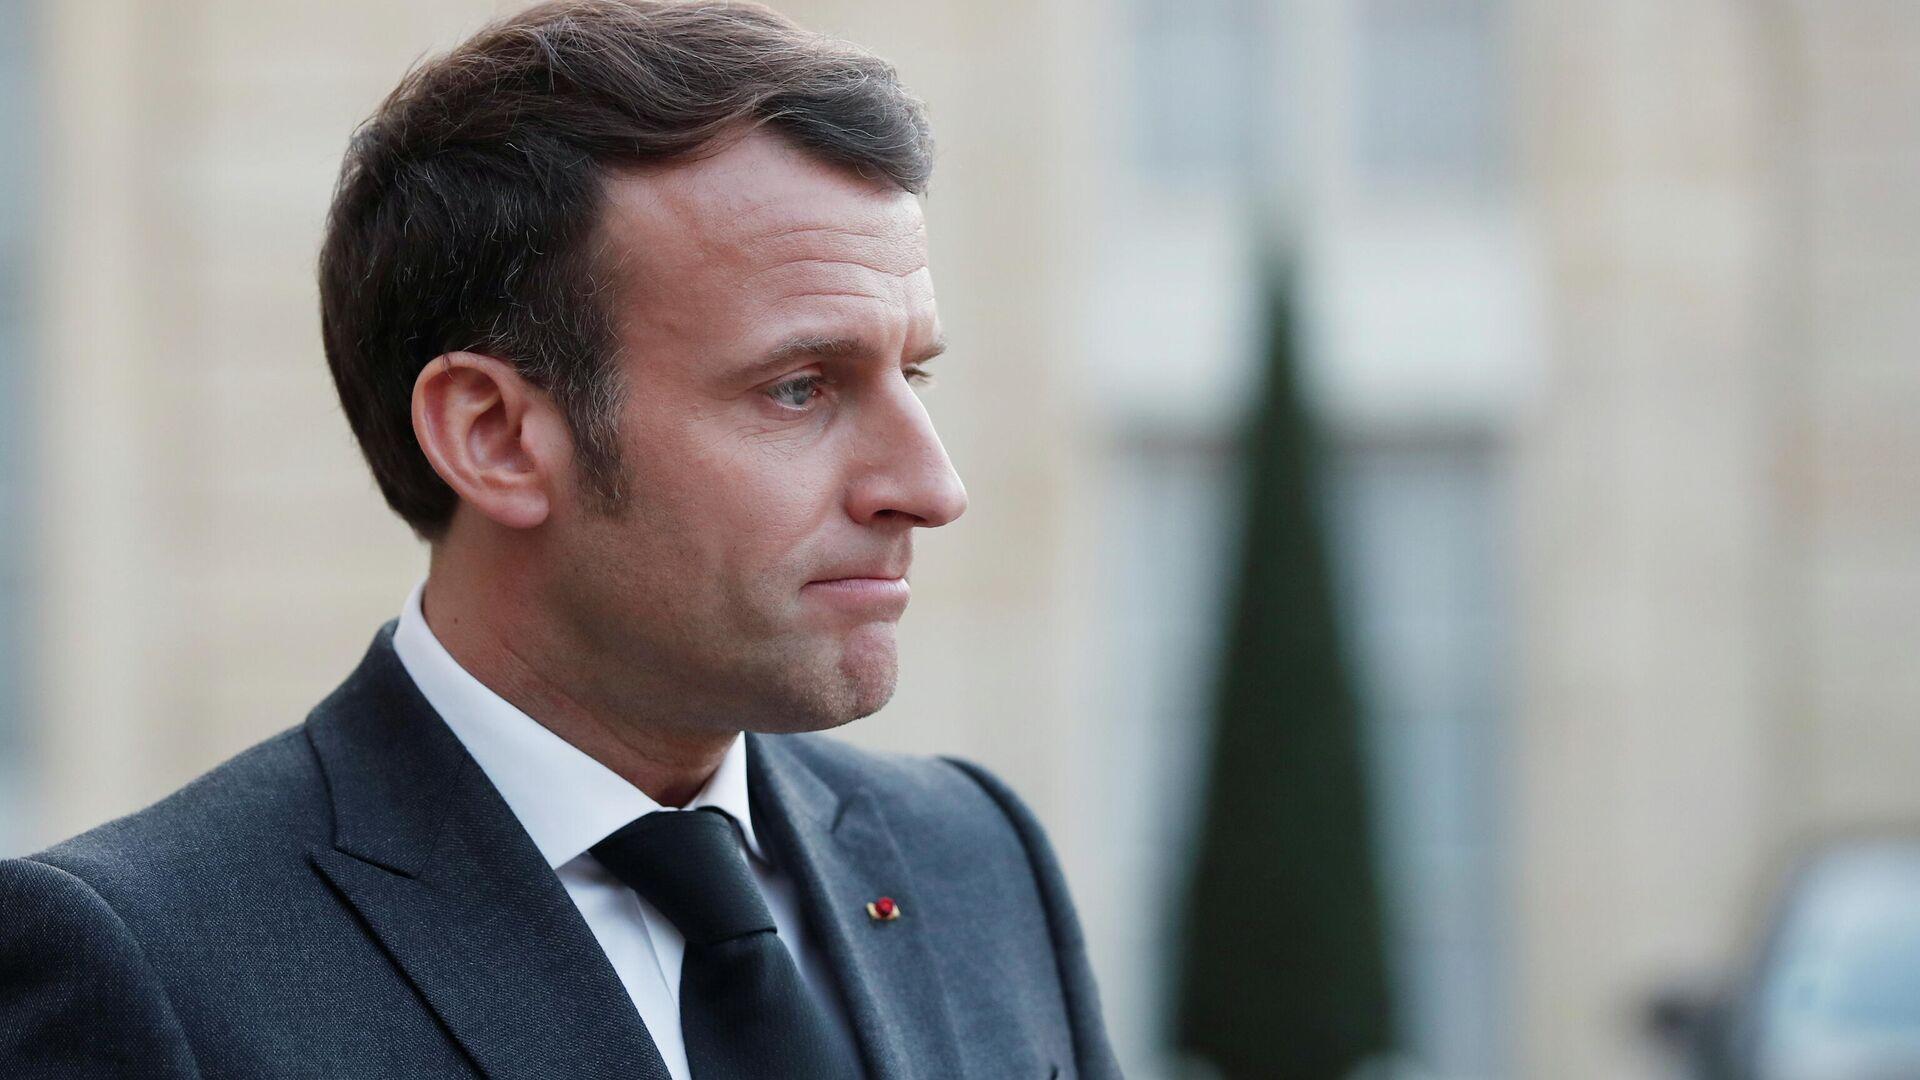 Emmanuel Macron, presidente de Francia - Sputnik Mundo, 1920, 24.03.2021